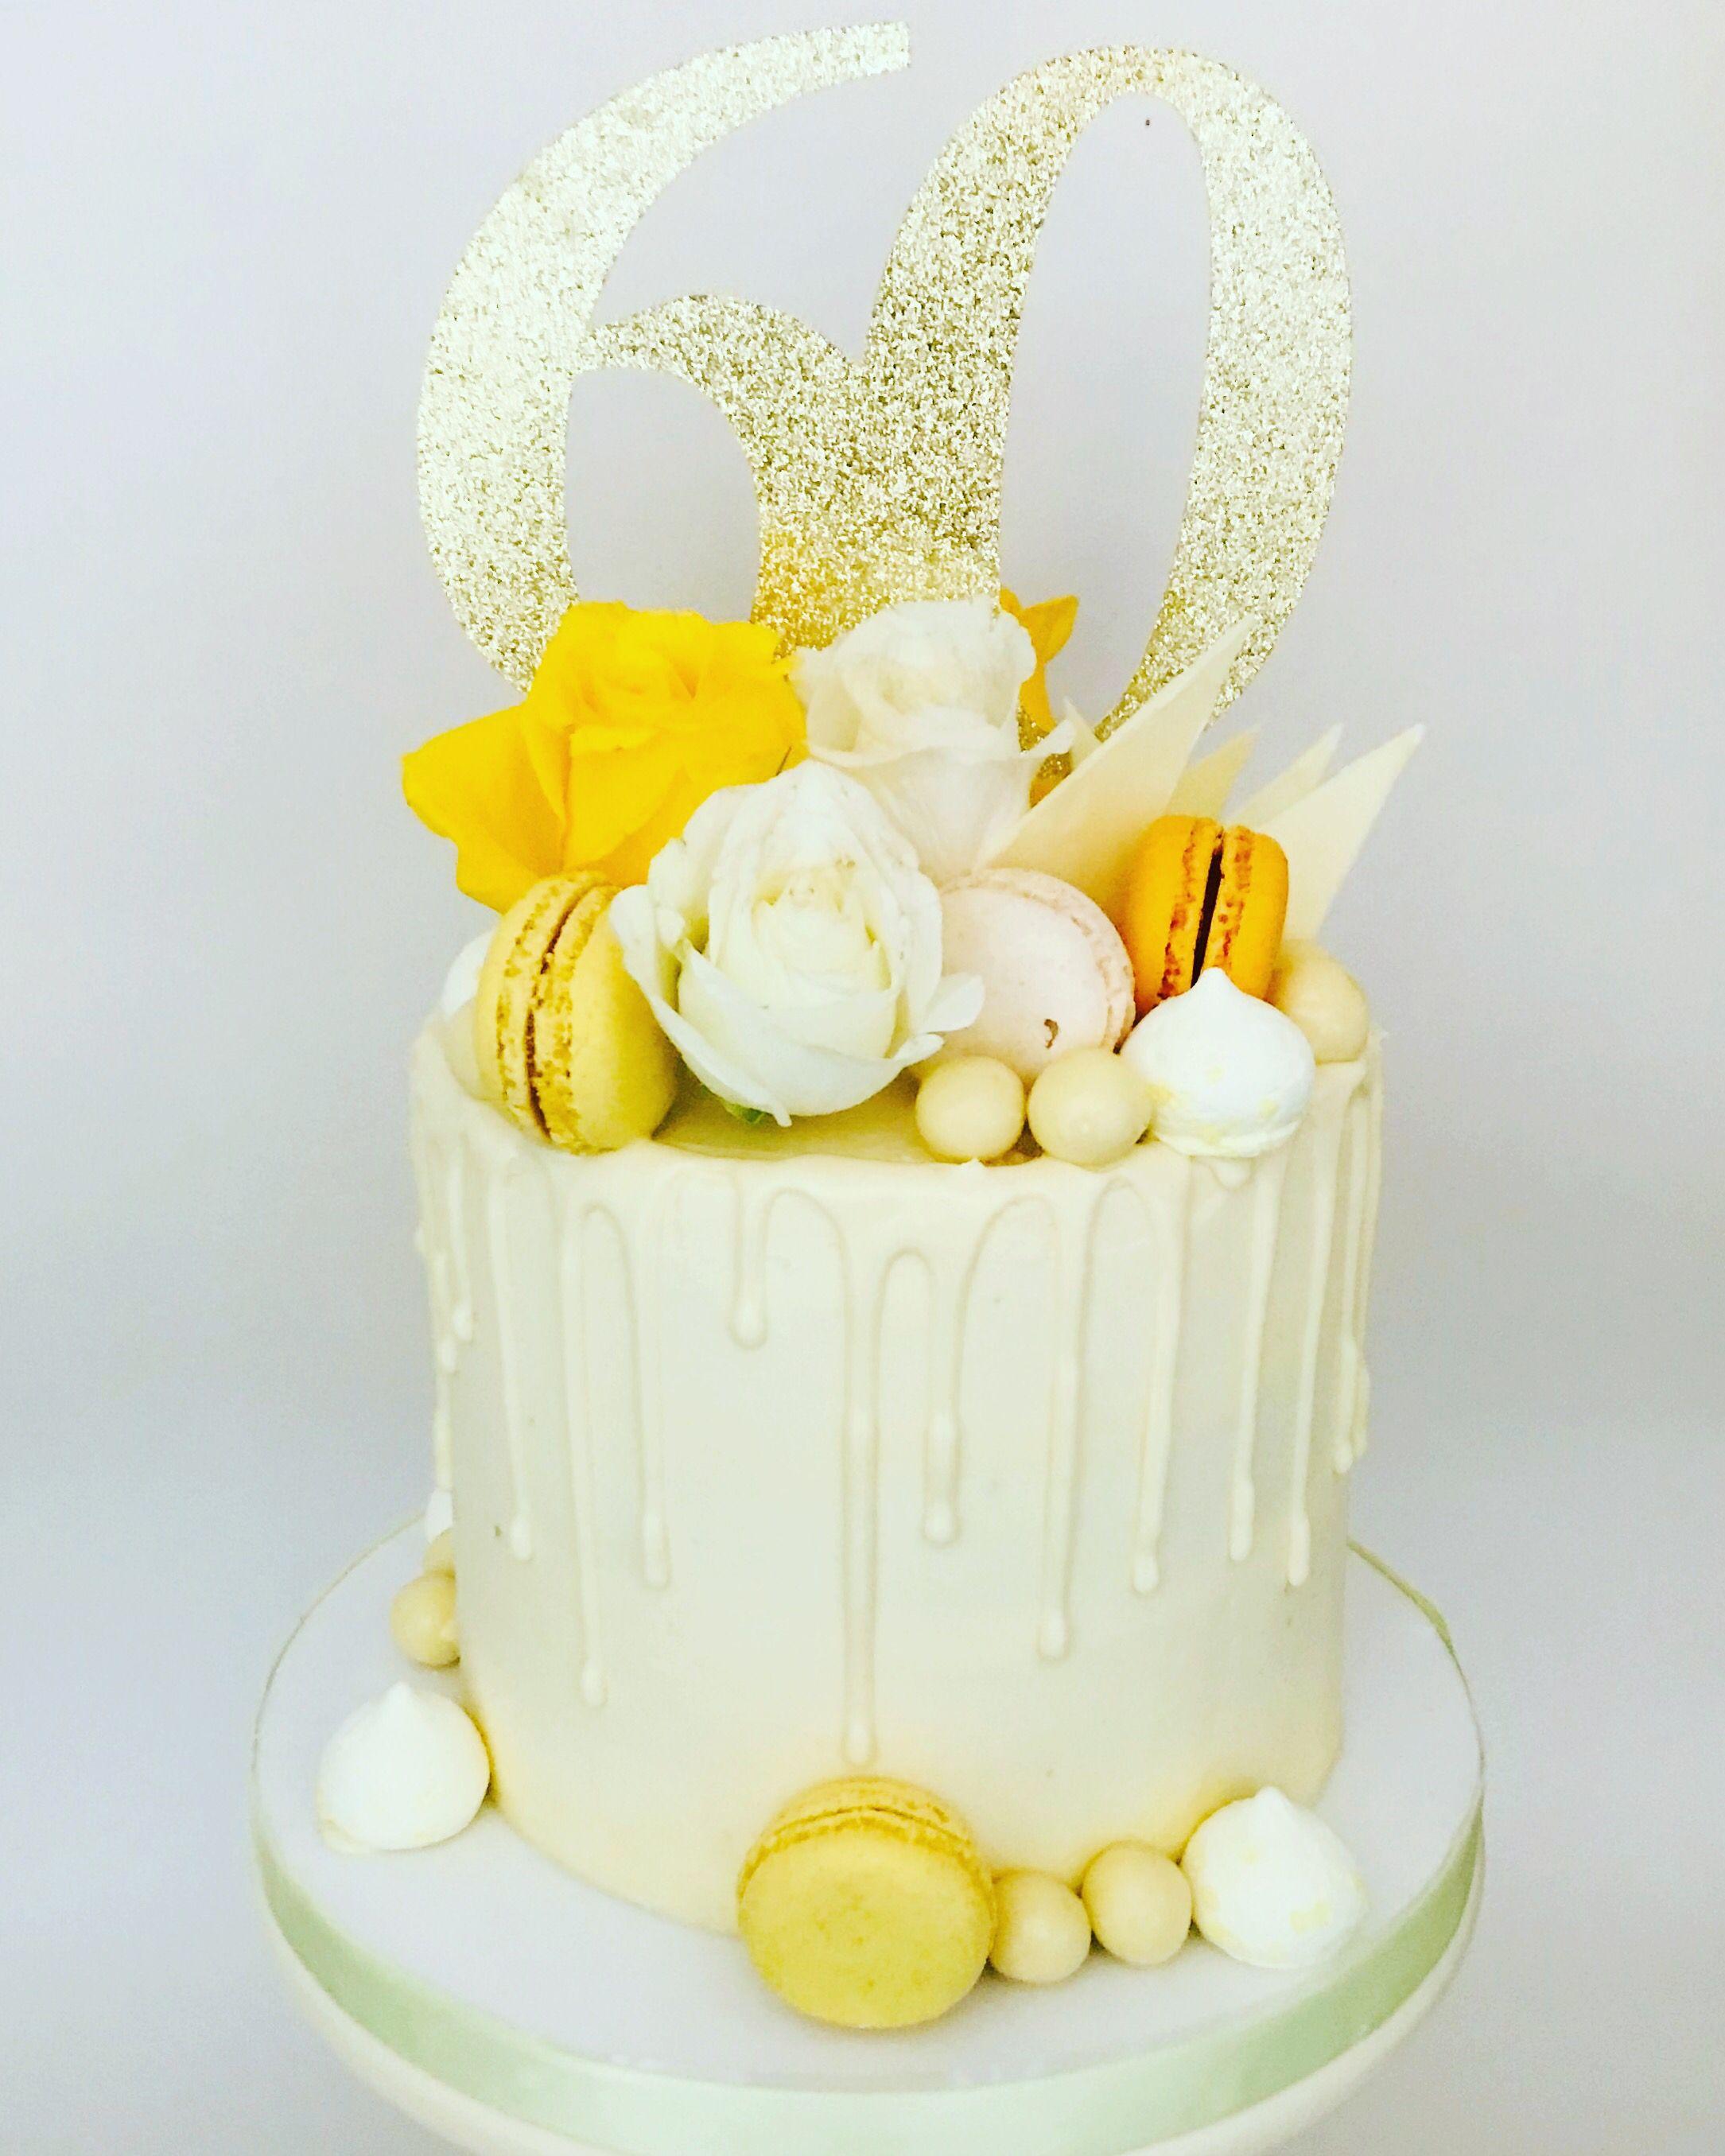 Pin By Tomasa Alvarez On Baking Lemon Birthday Cakes Drip Cakes